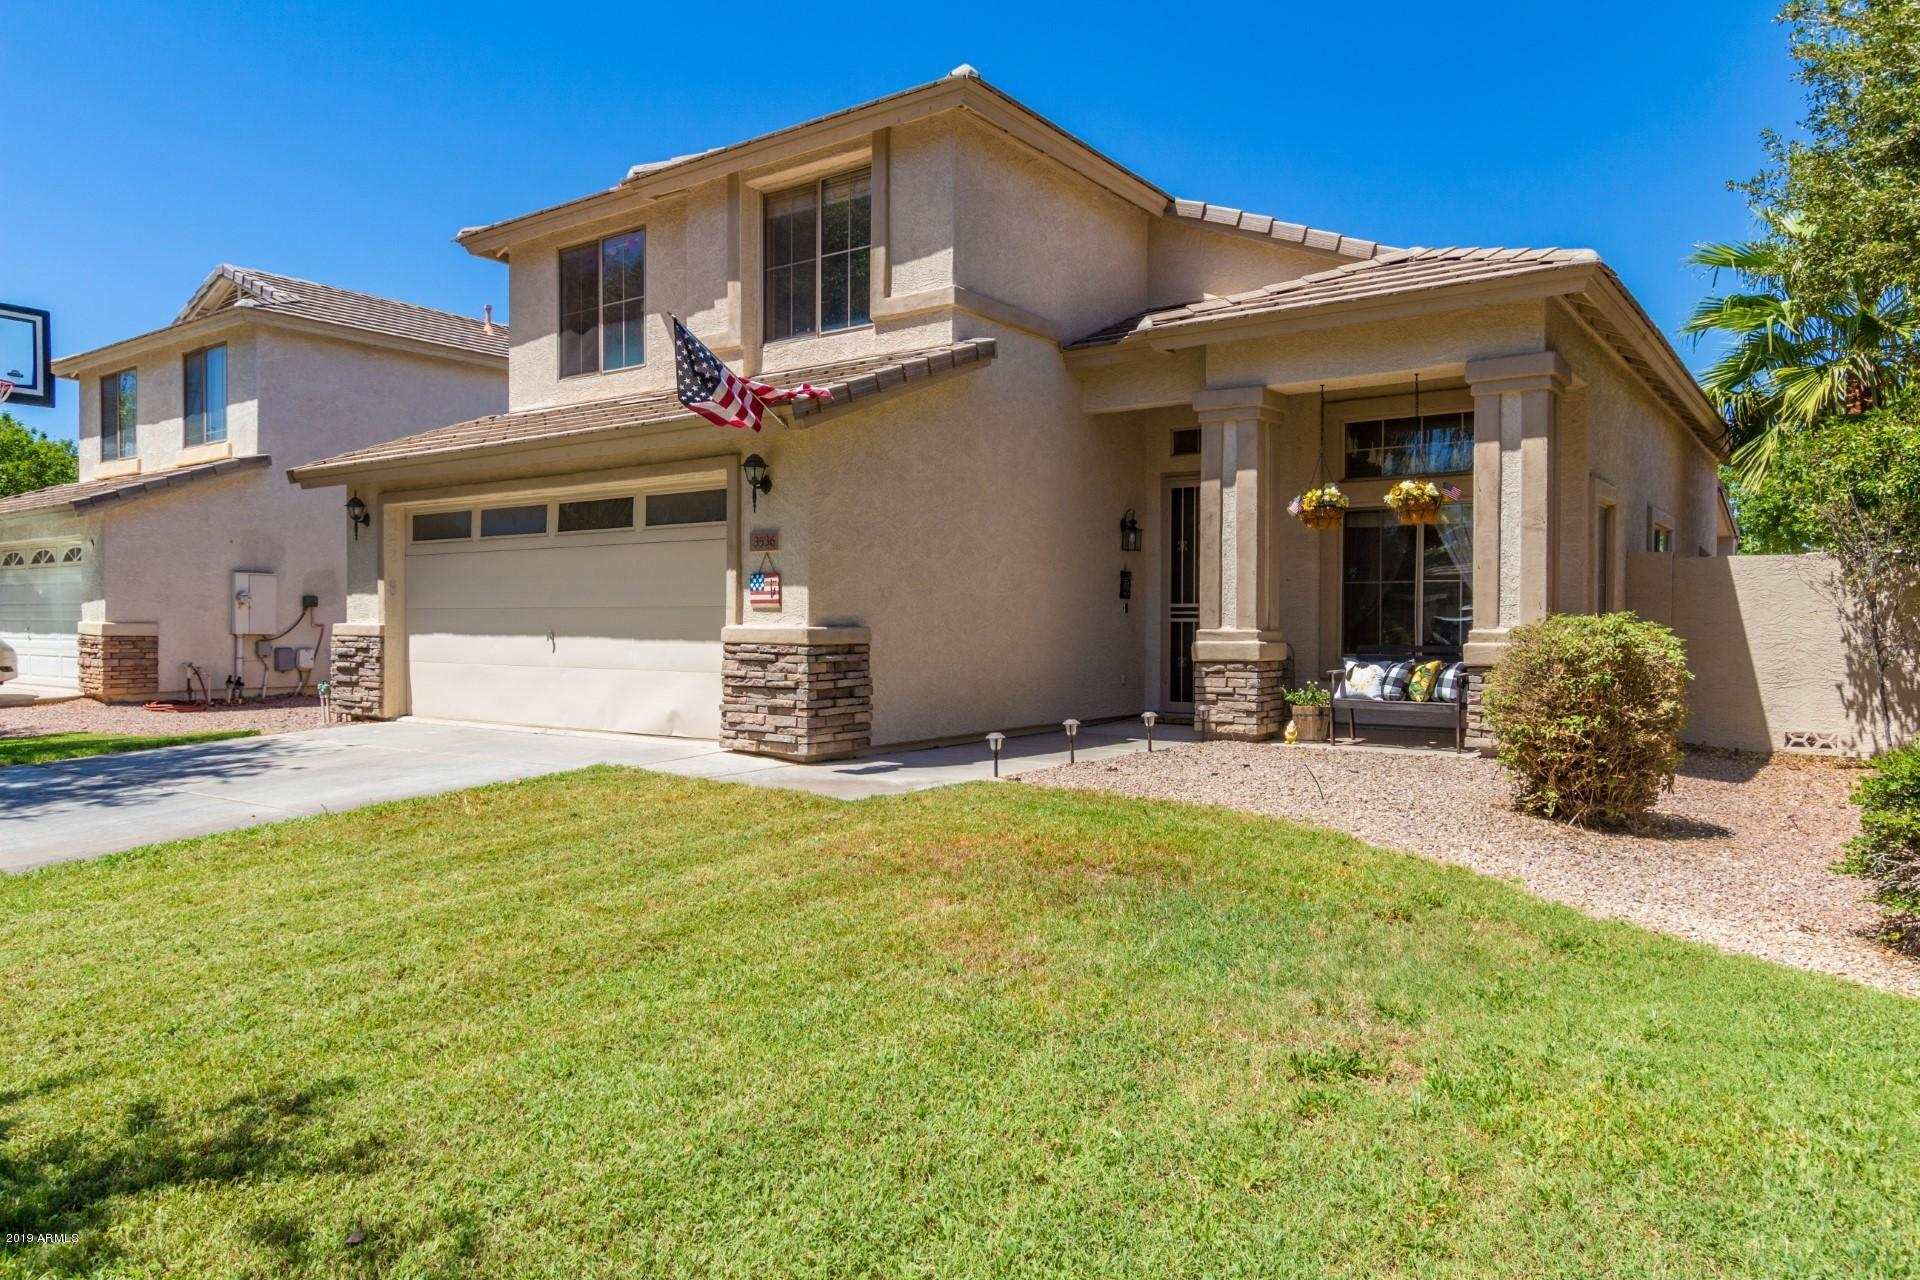 Photo of 3536 E BRUCE Avenue, Gilbert, AZ 85234